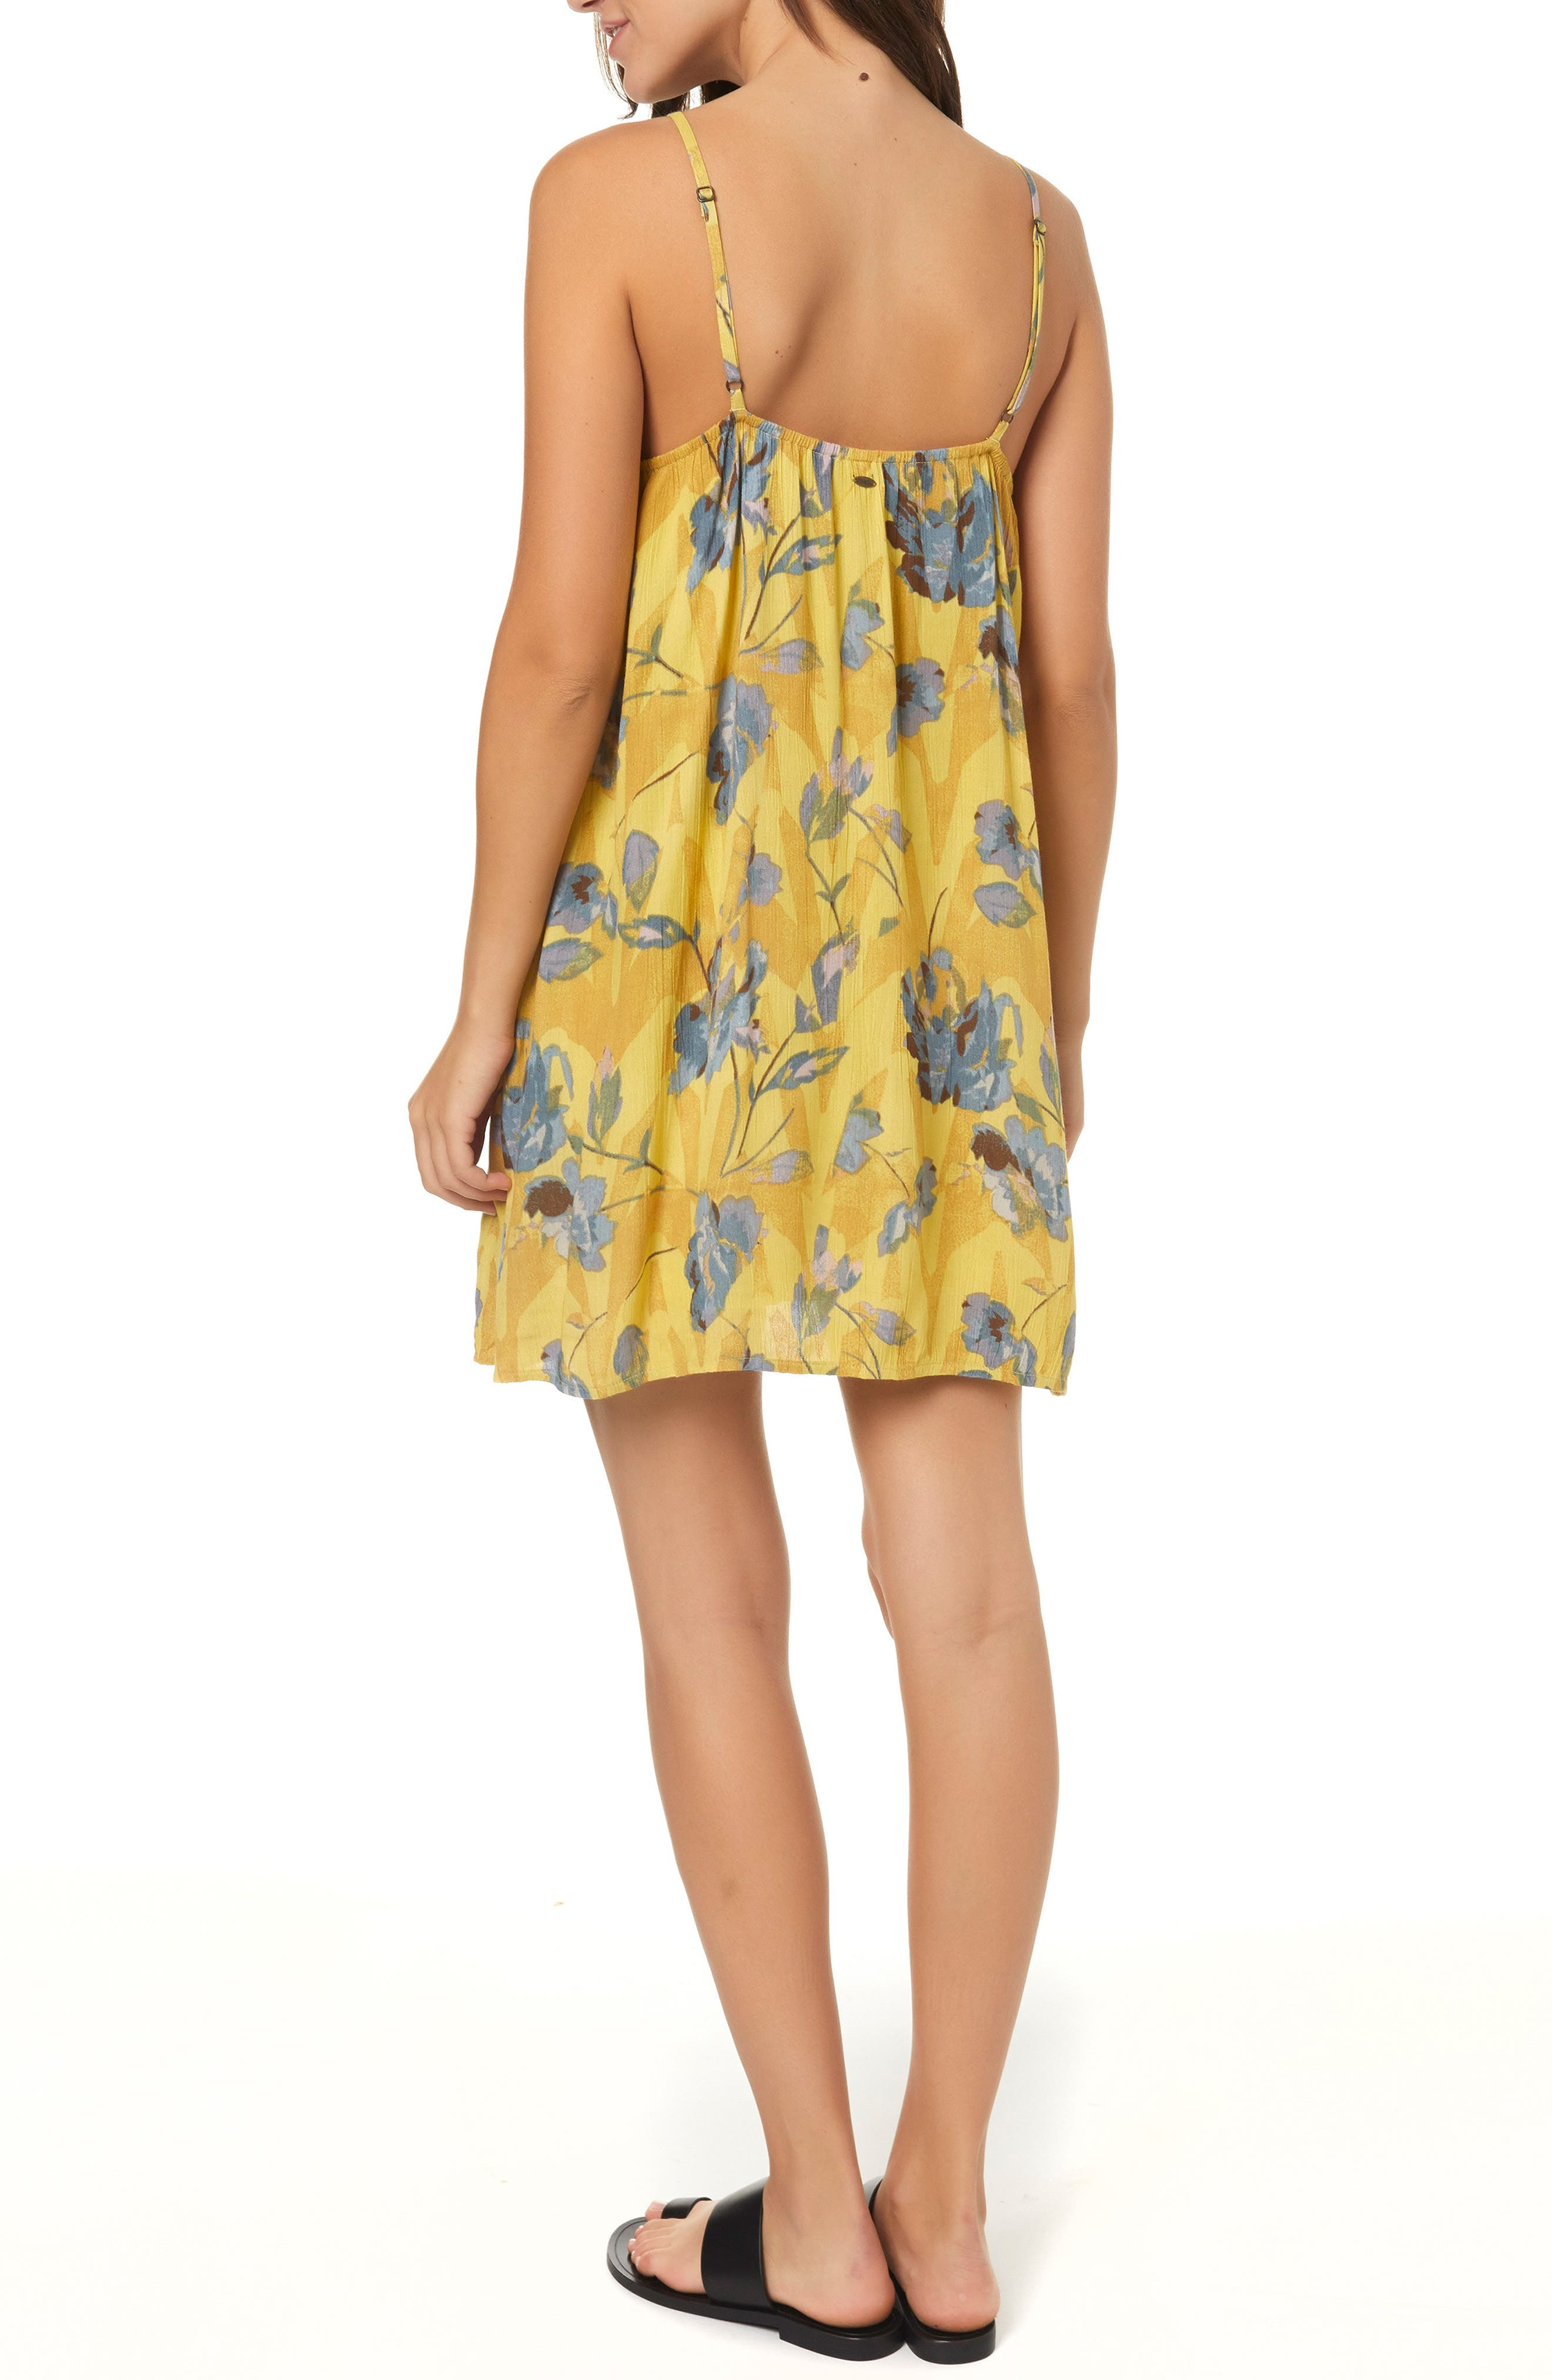 Henna Floral Print Woven Tank Dress,                             Alternate thumbnail 2, color,                             MULTI COLORED